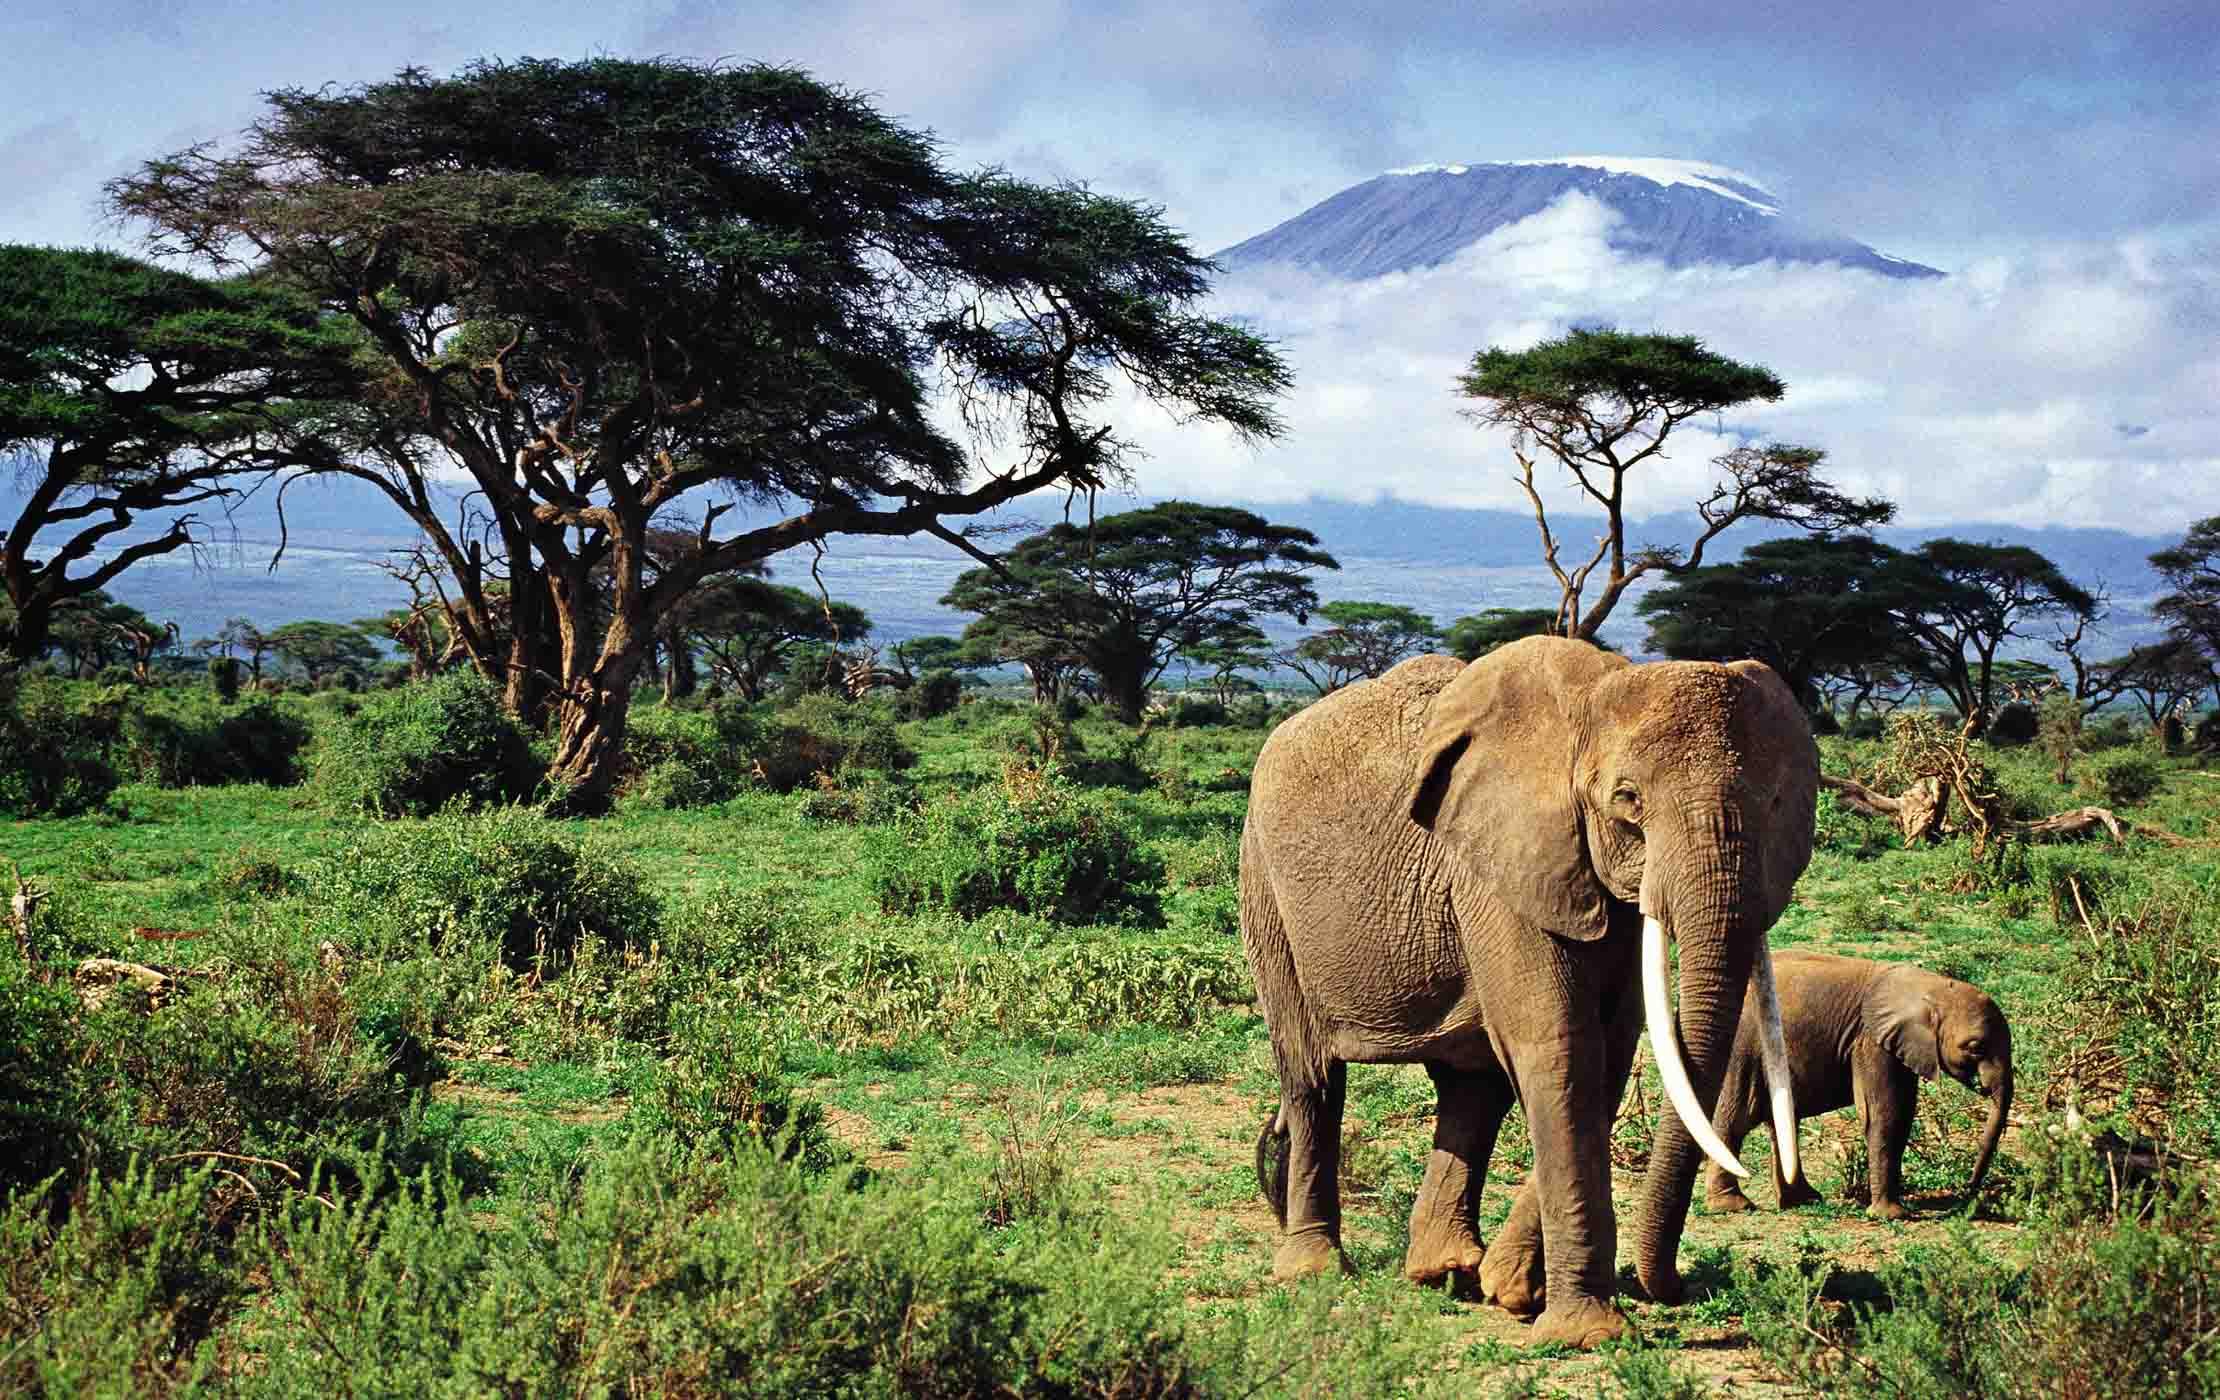 Elephant and baby elephant waling in Mount Kilimanjarol